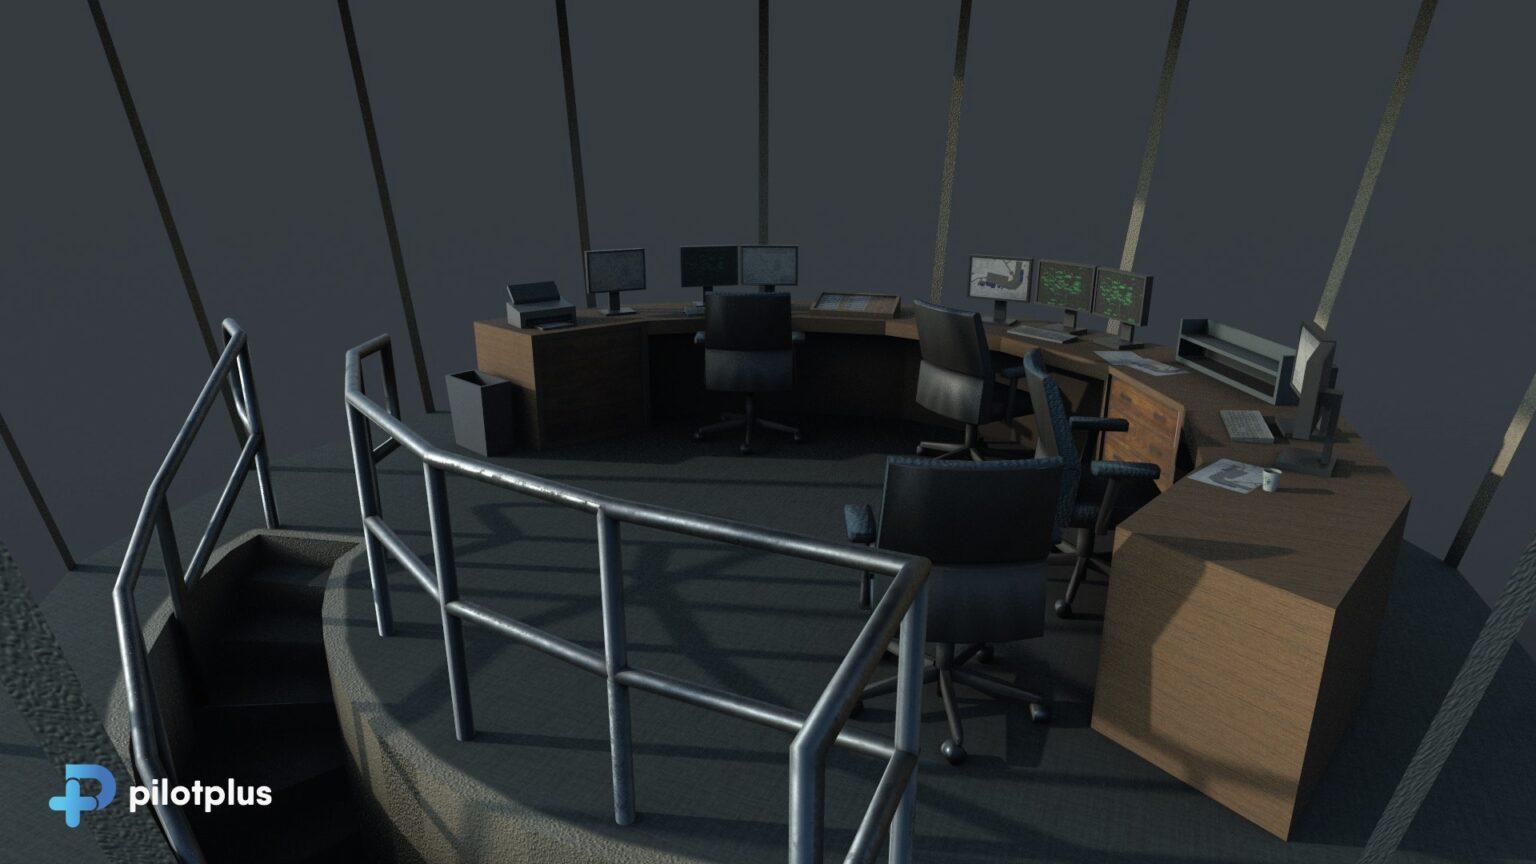 pilotplus_Southend (2)